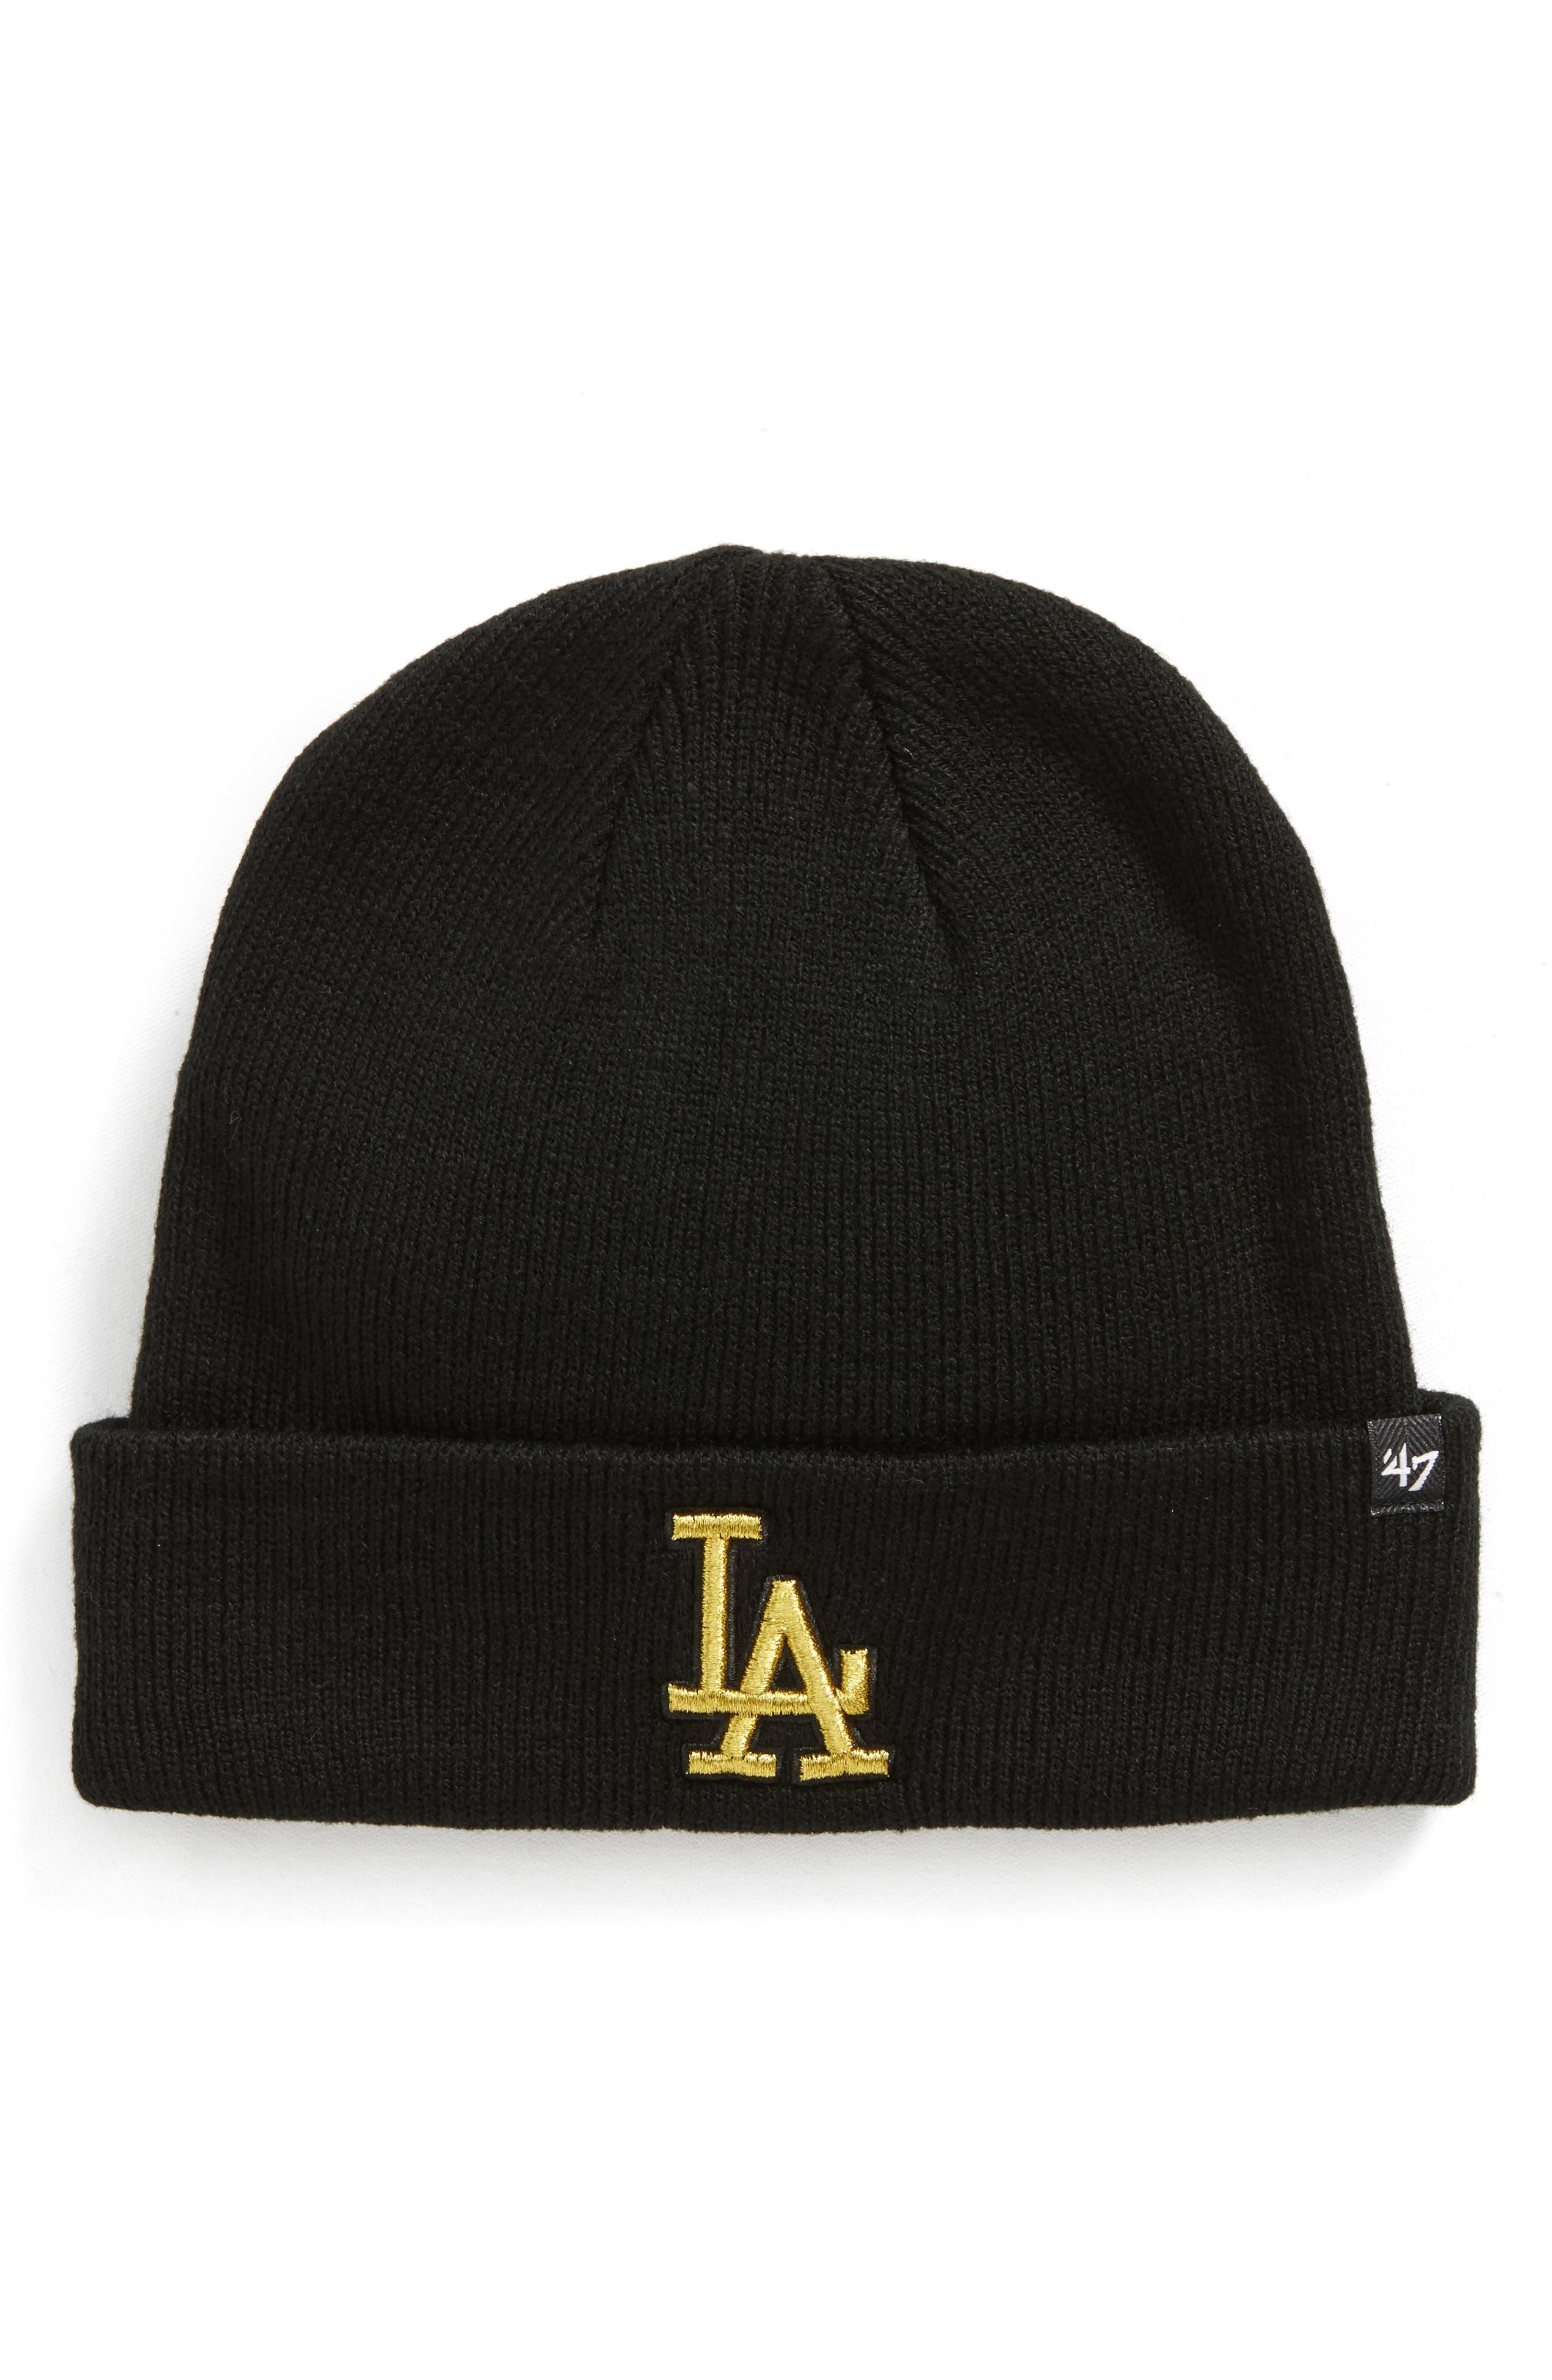 Los Angeles Dodgers Metallic Beanie,                             Main thumbnail 1, color,                             Black